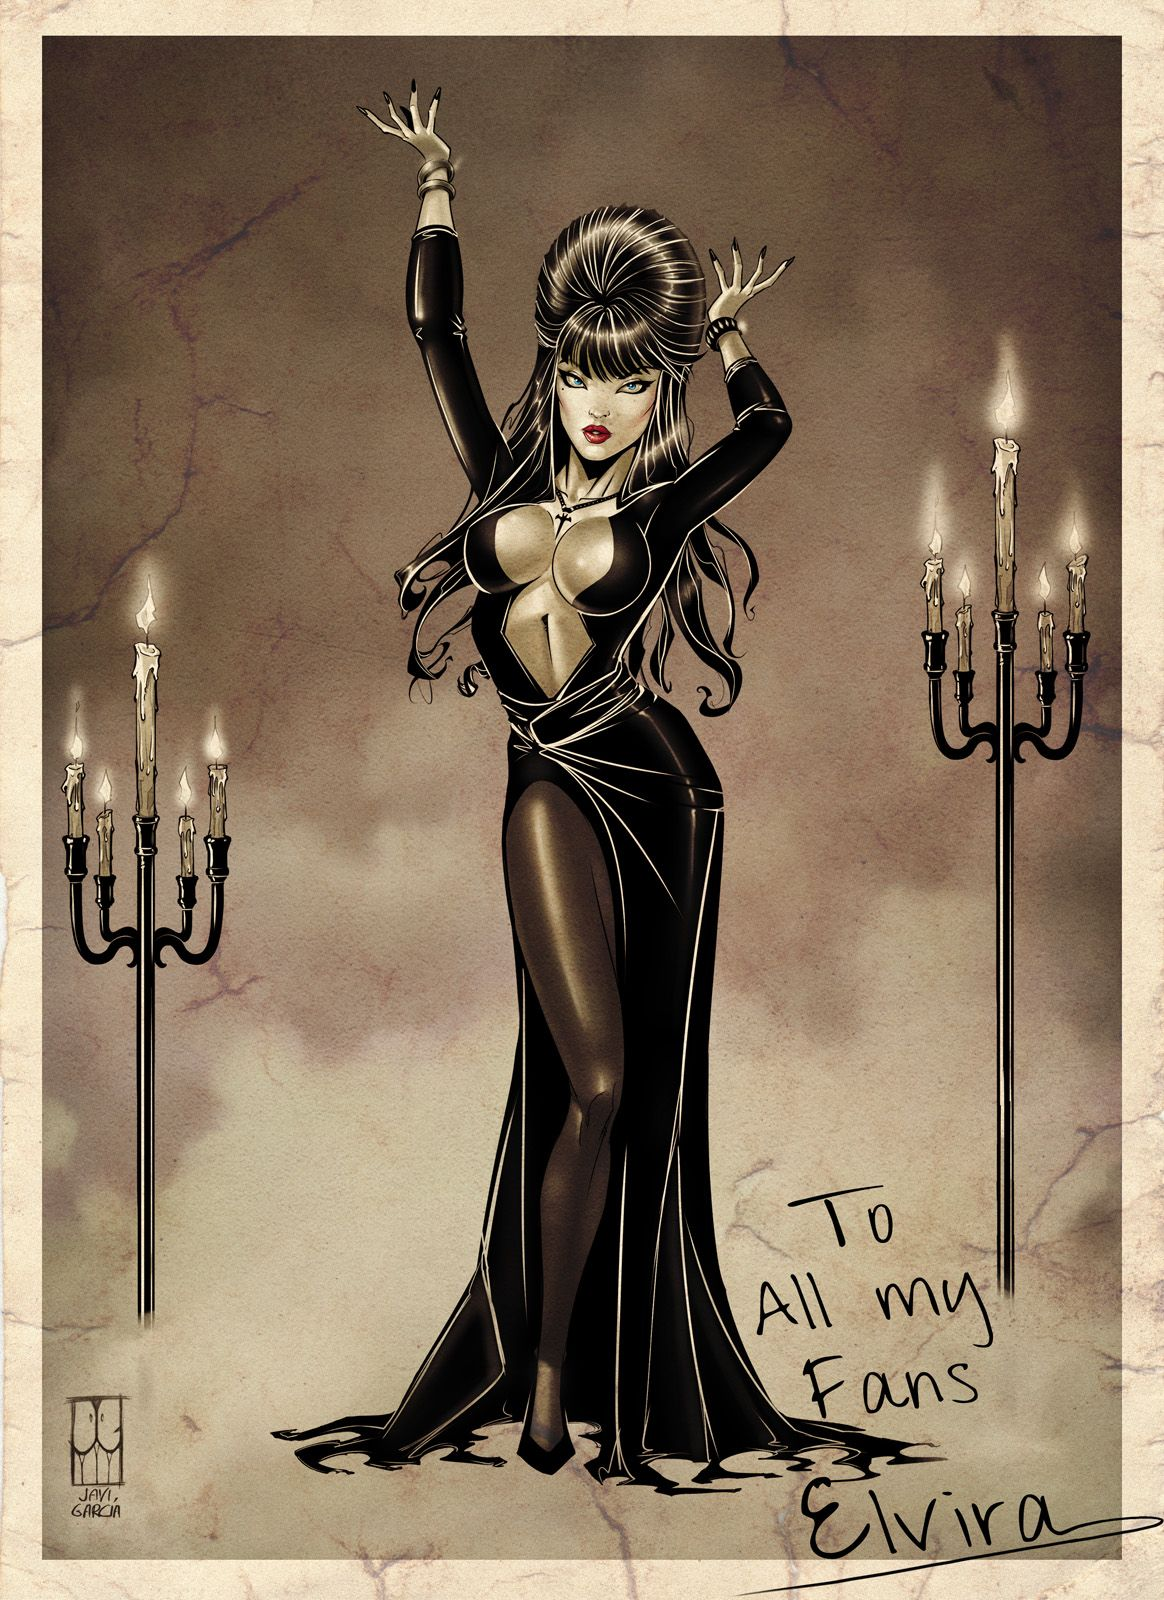 Elvira by JaviGarcia on DeviantArt